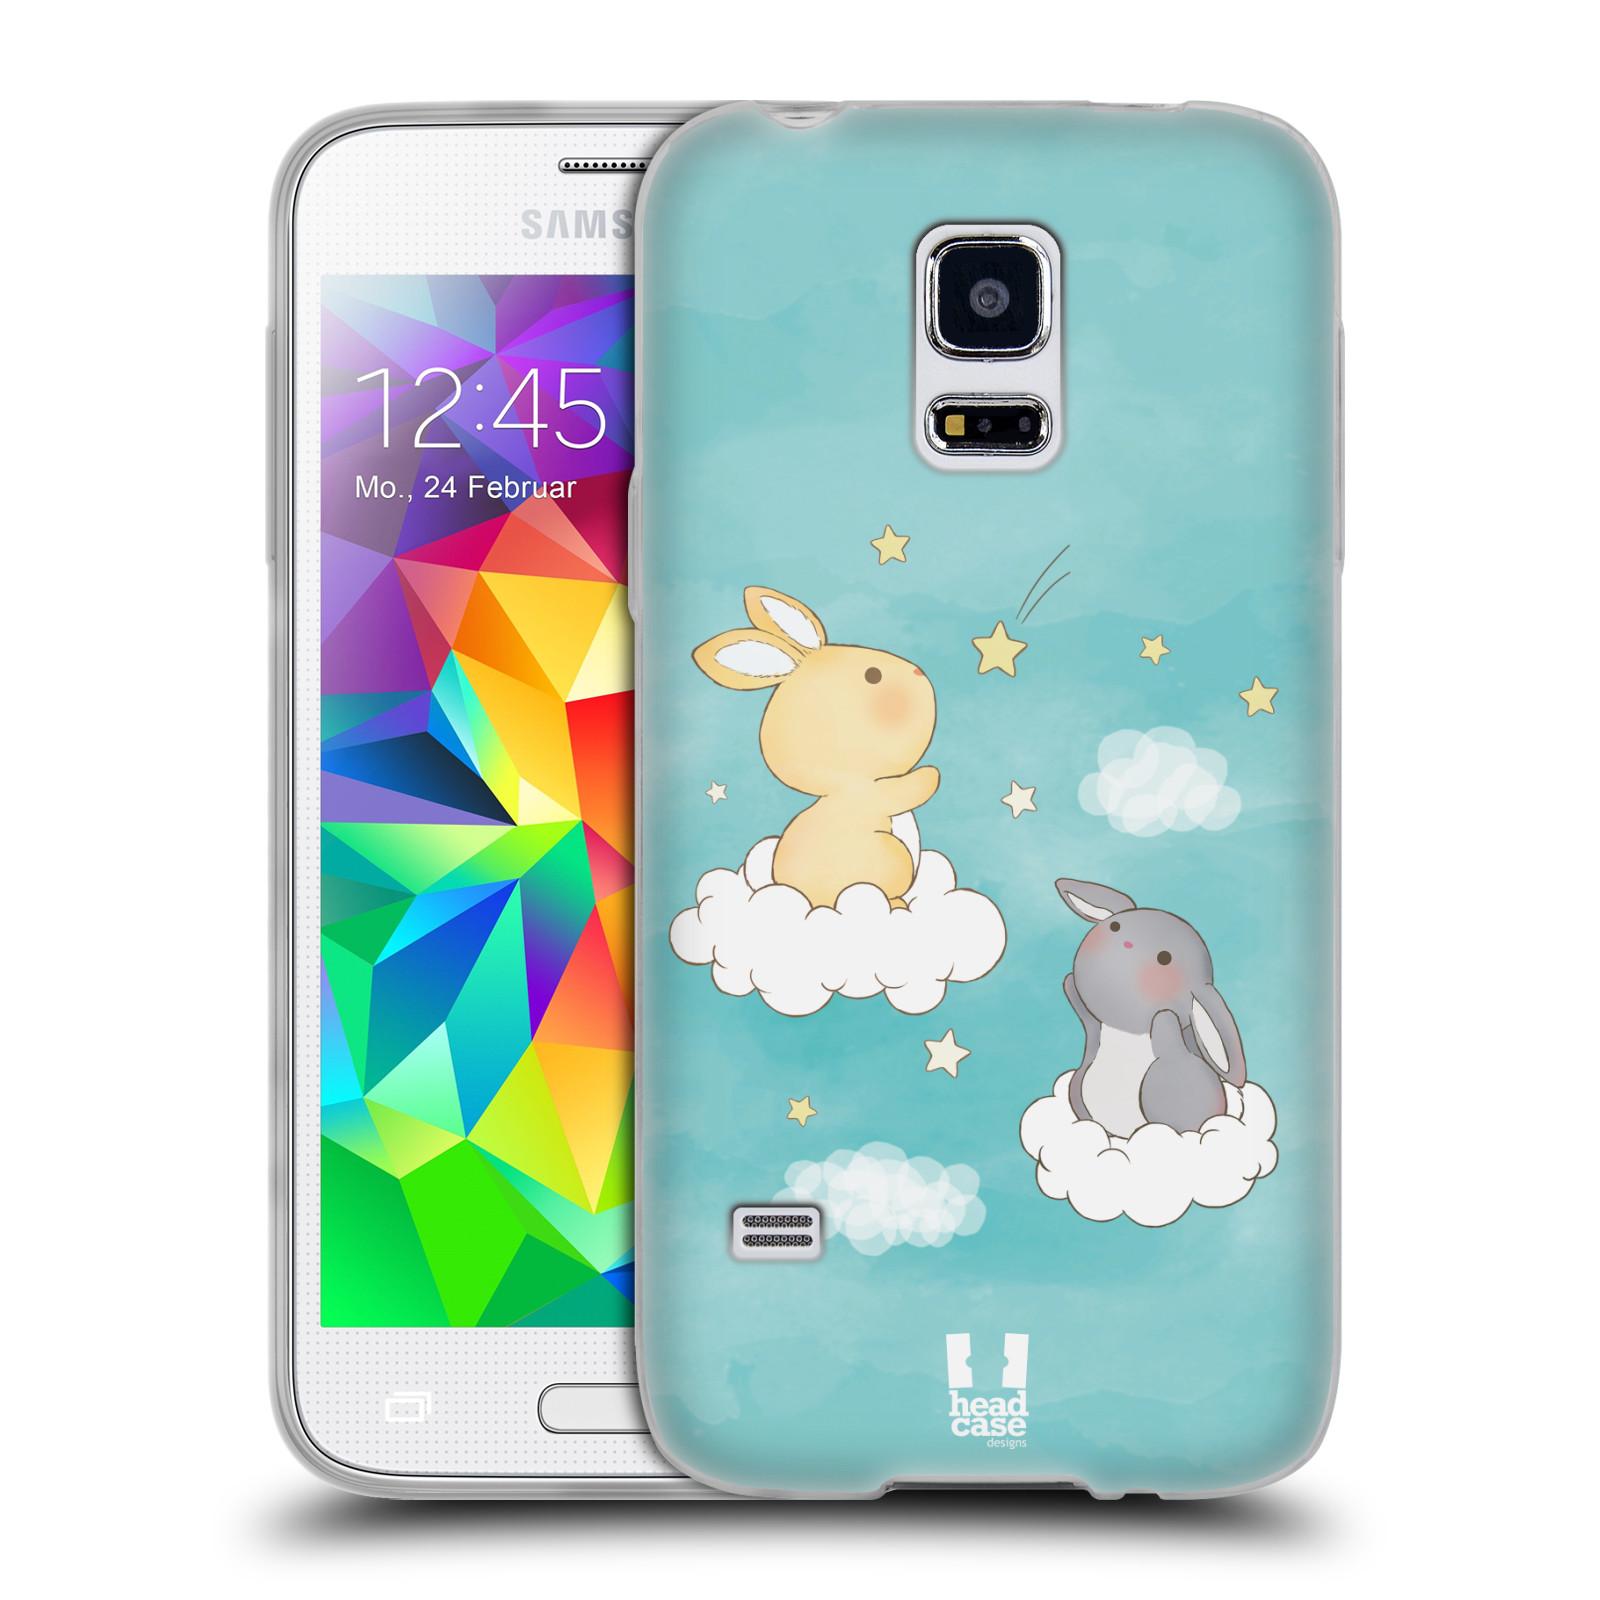 HEAD CASE silikonový obal na mobil Samsung Galaxy S5 MINI vzor králíček a hvězdy modrá